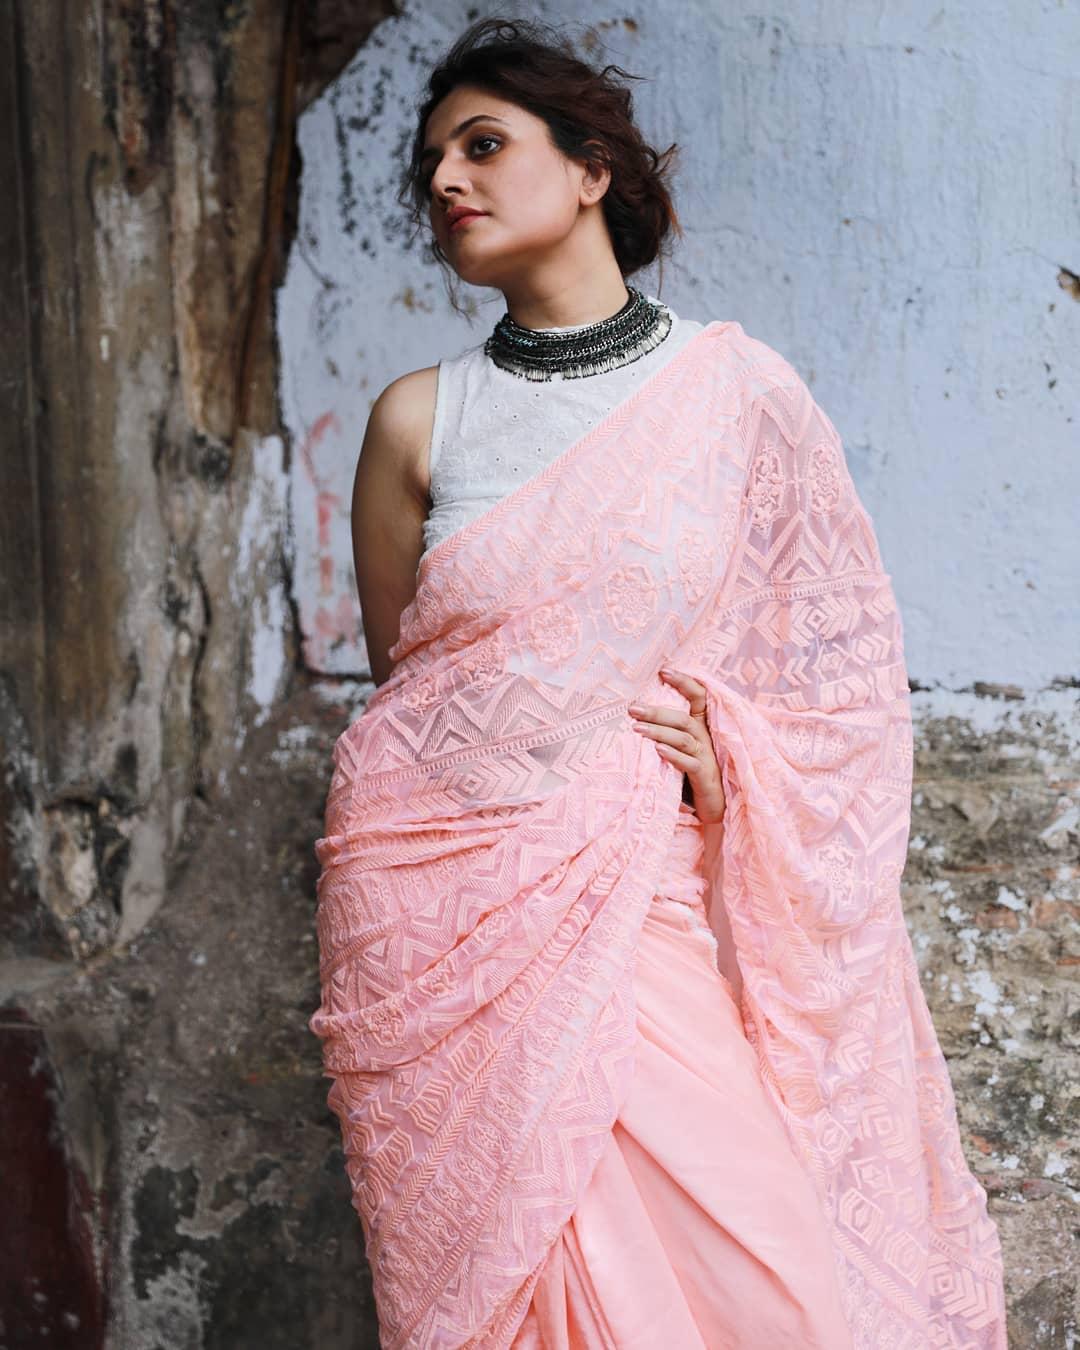 Sleeveless Saree Blouse Designs That